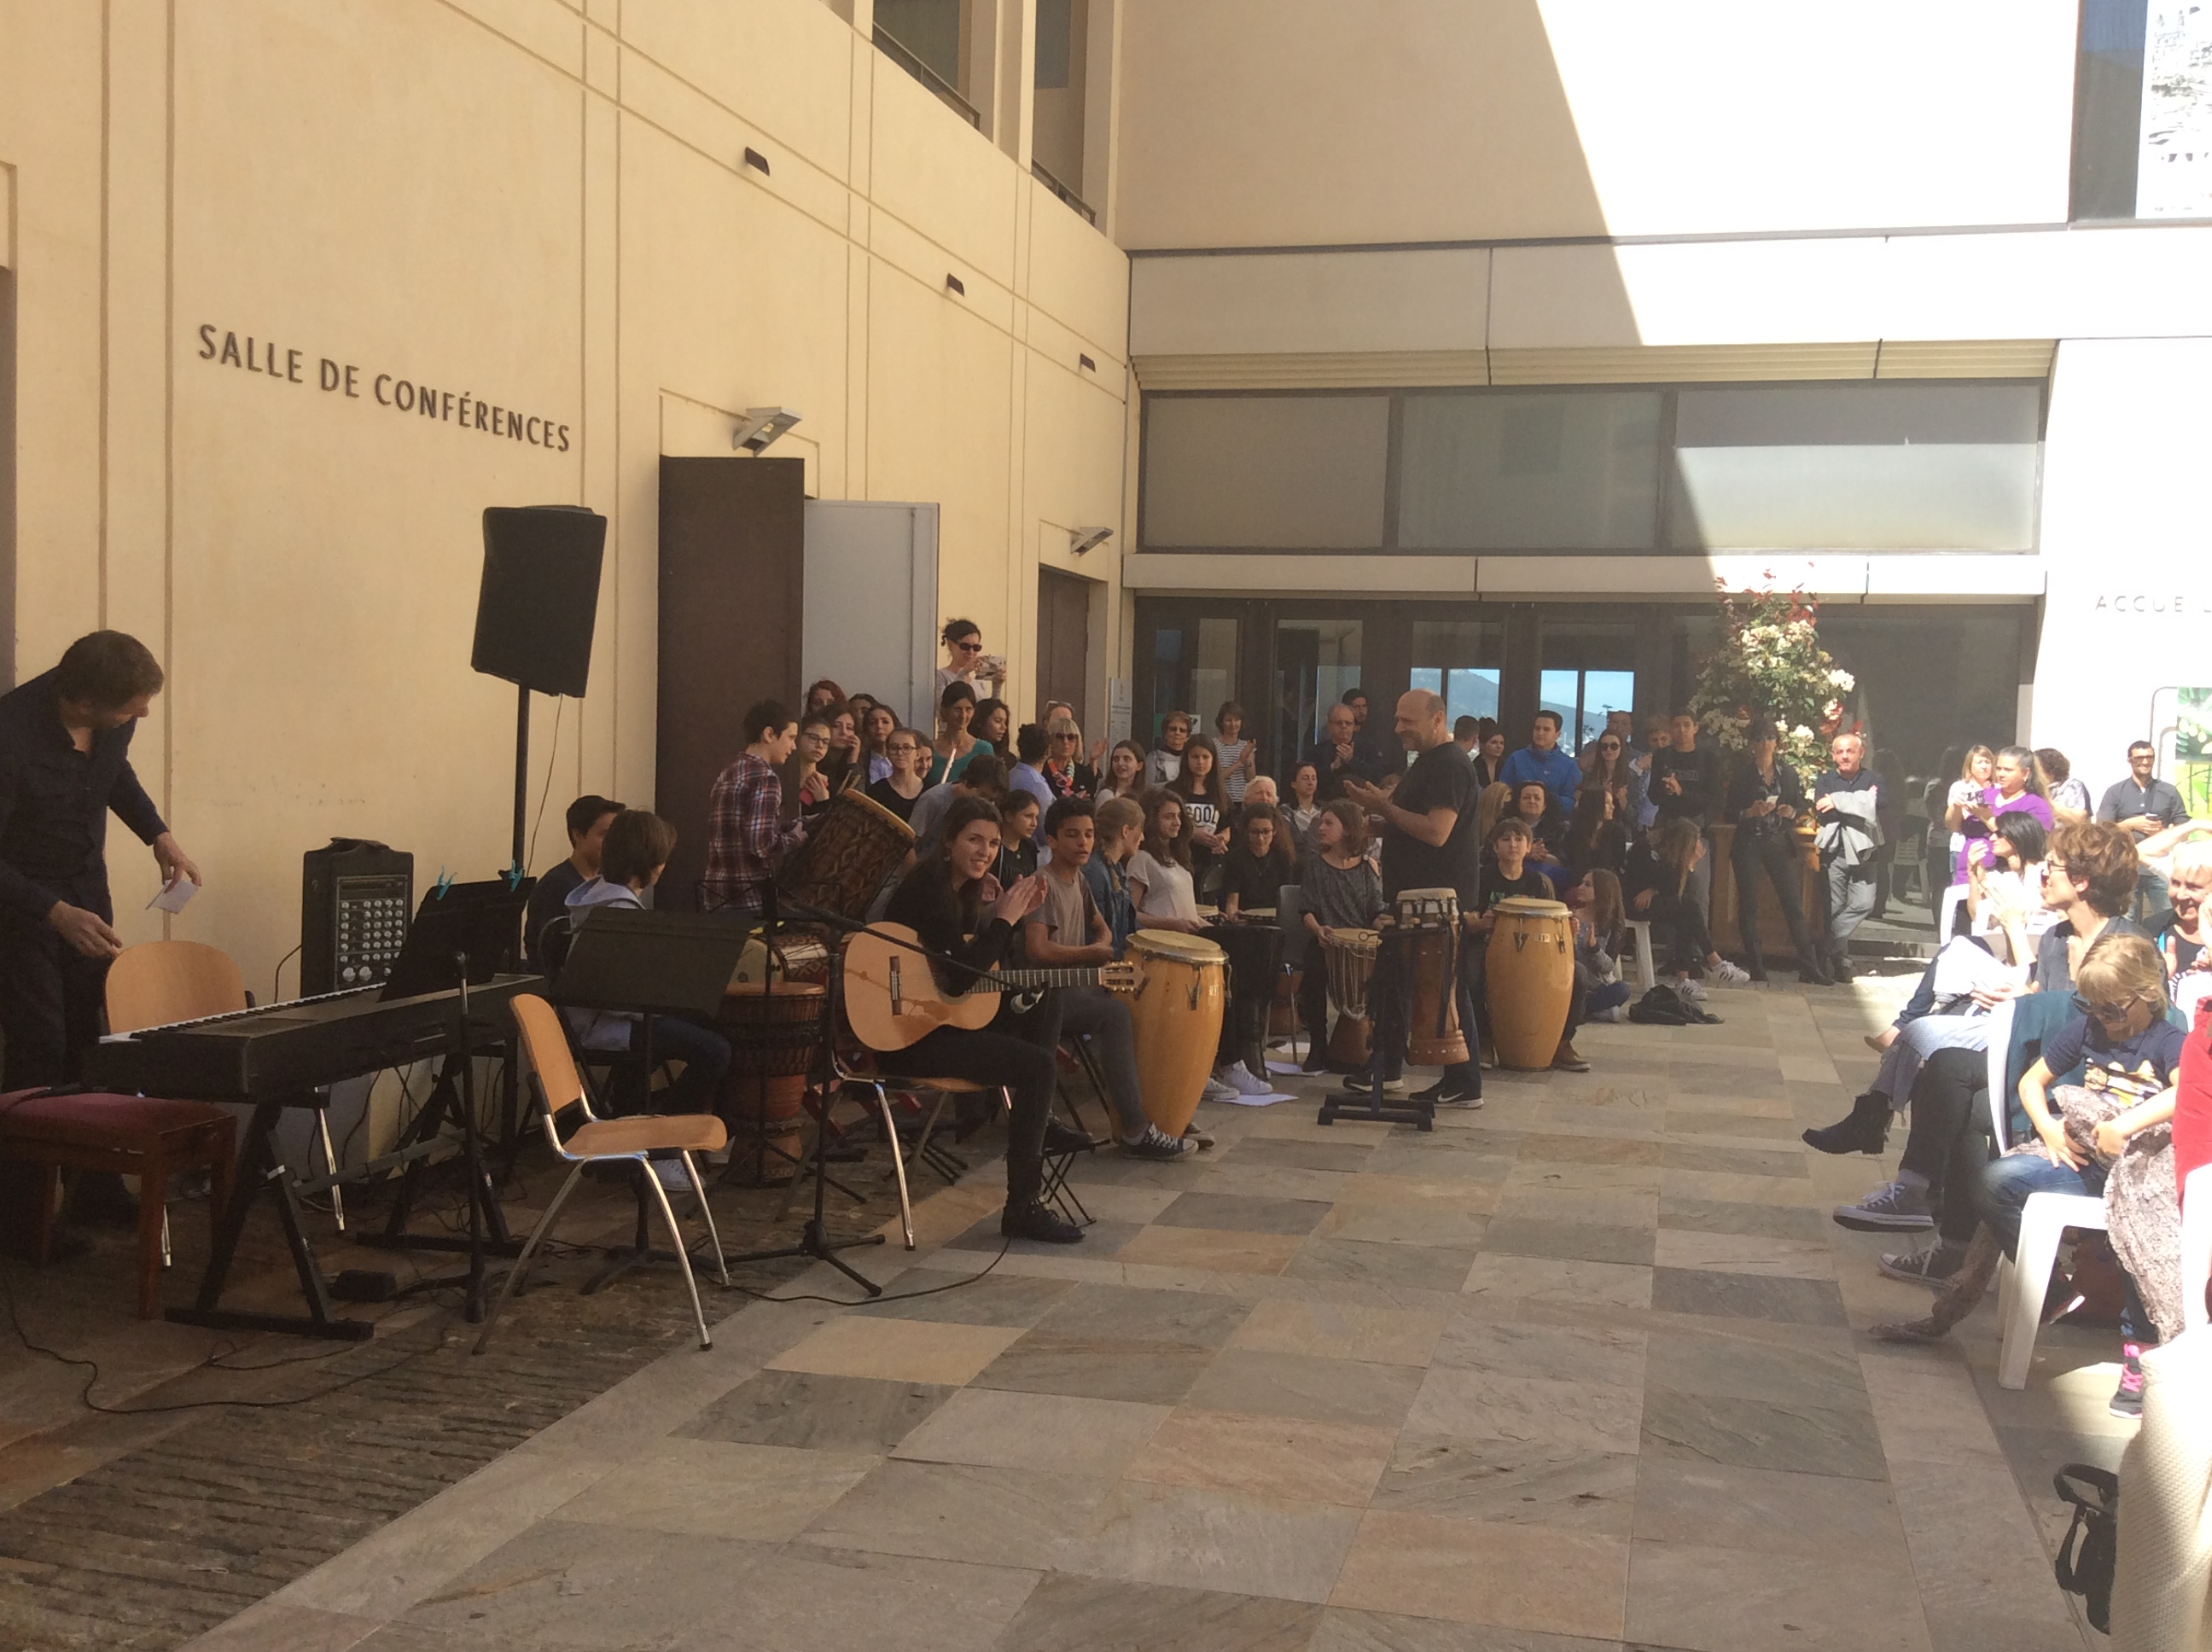 Le lycée Fred-Scaramoni de Bastia présente son projet innovant